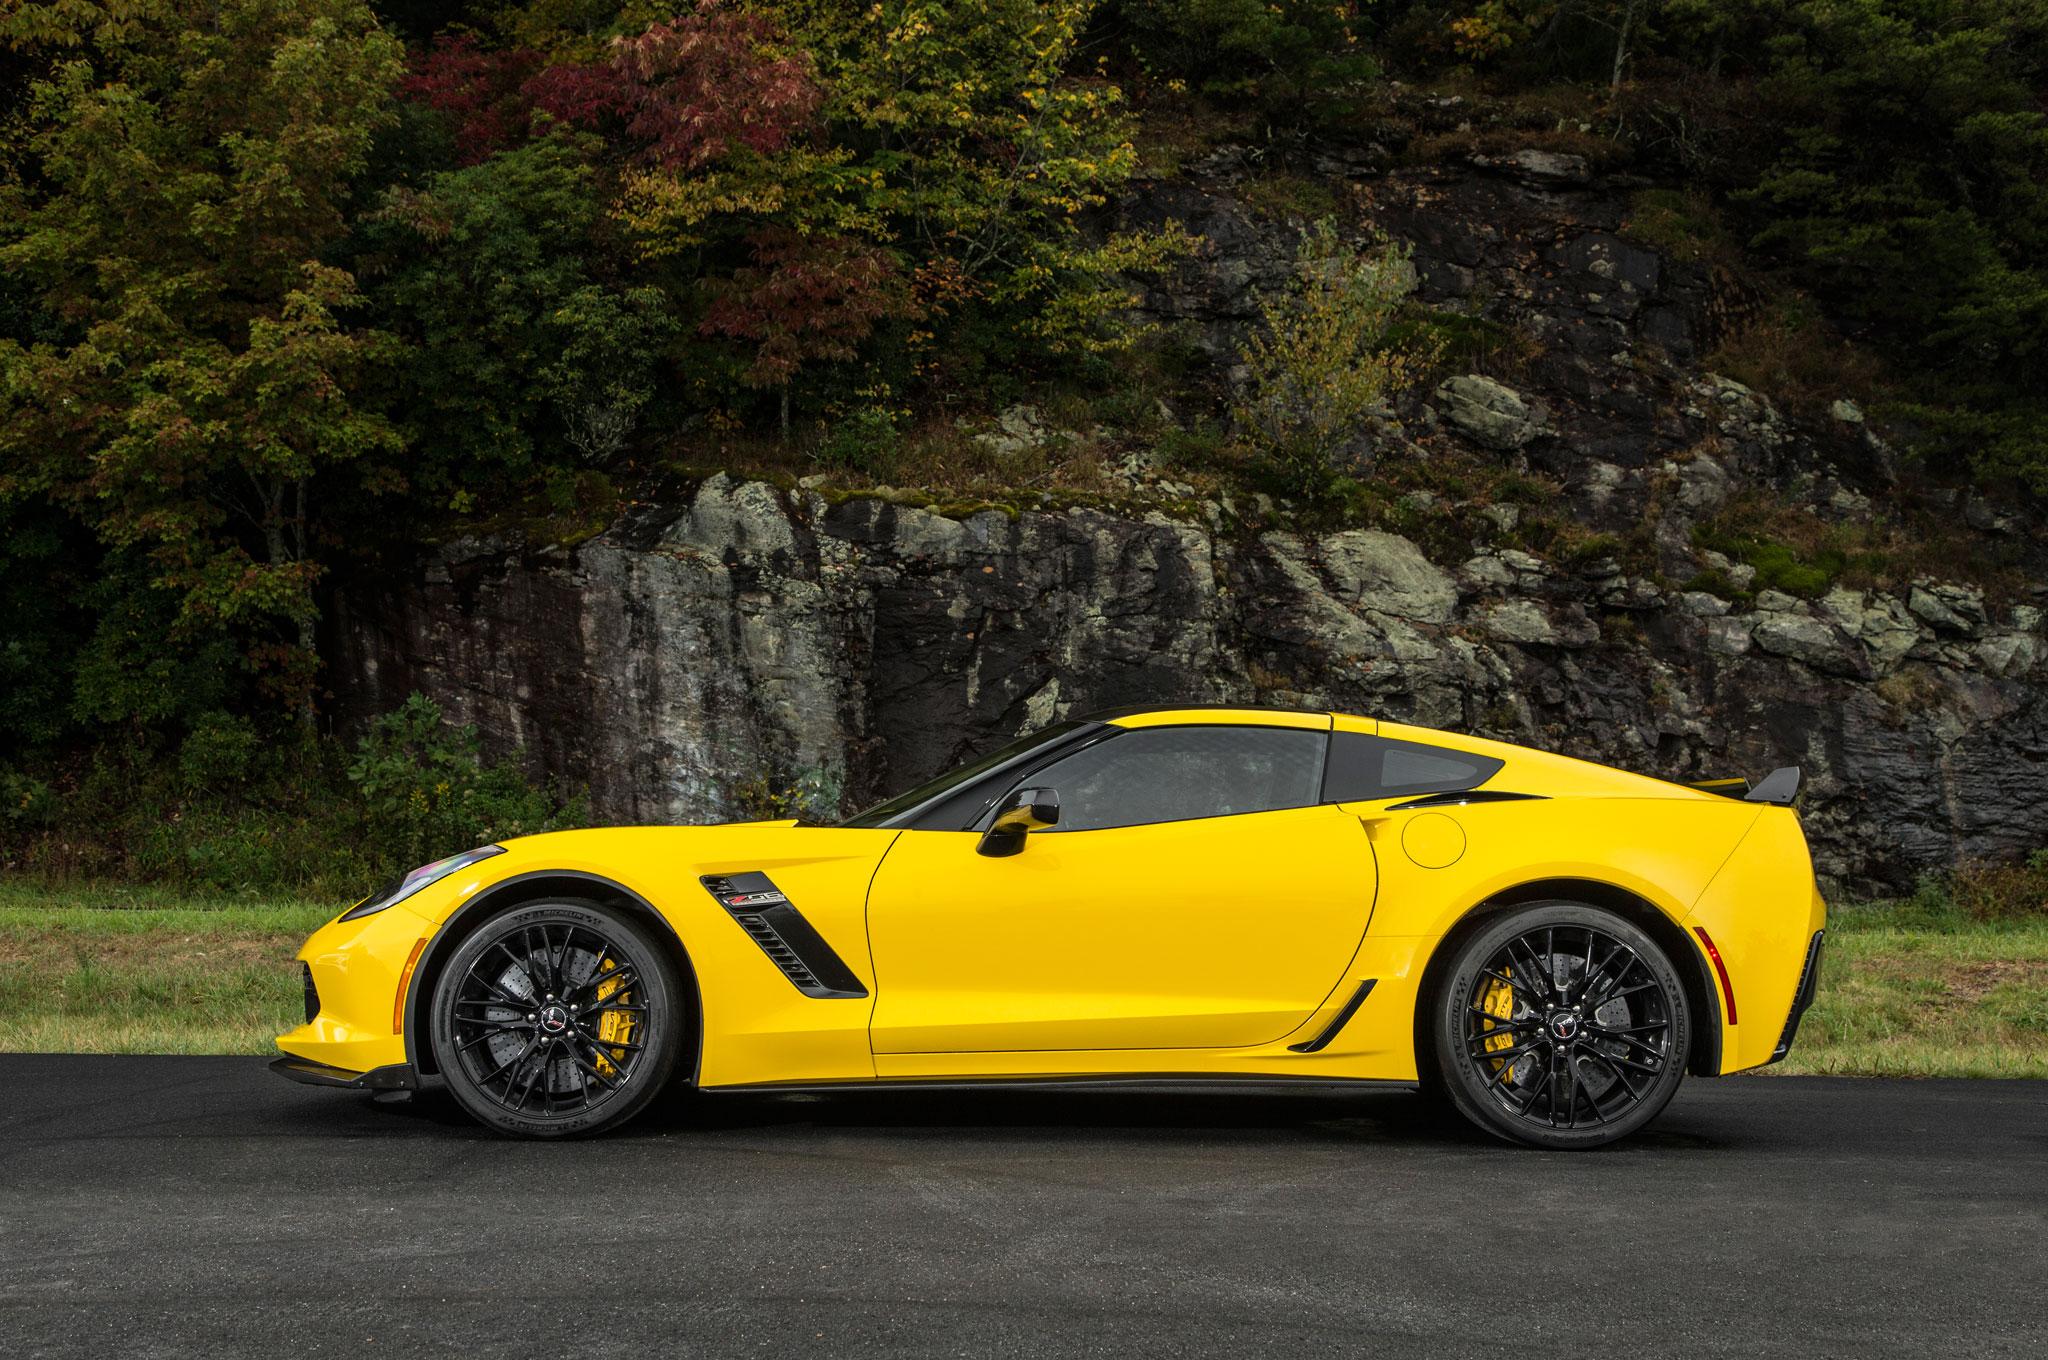 2015 chevrolet corvette z06 makes 650 hp automobile magazine. Black Bedroom Furniture Sets. Home Design Ideas